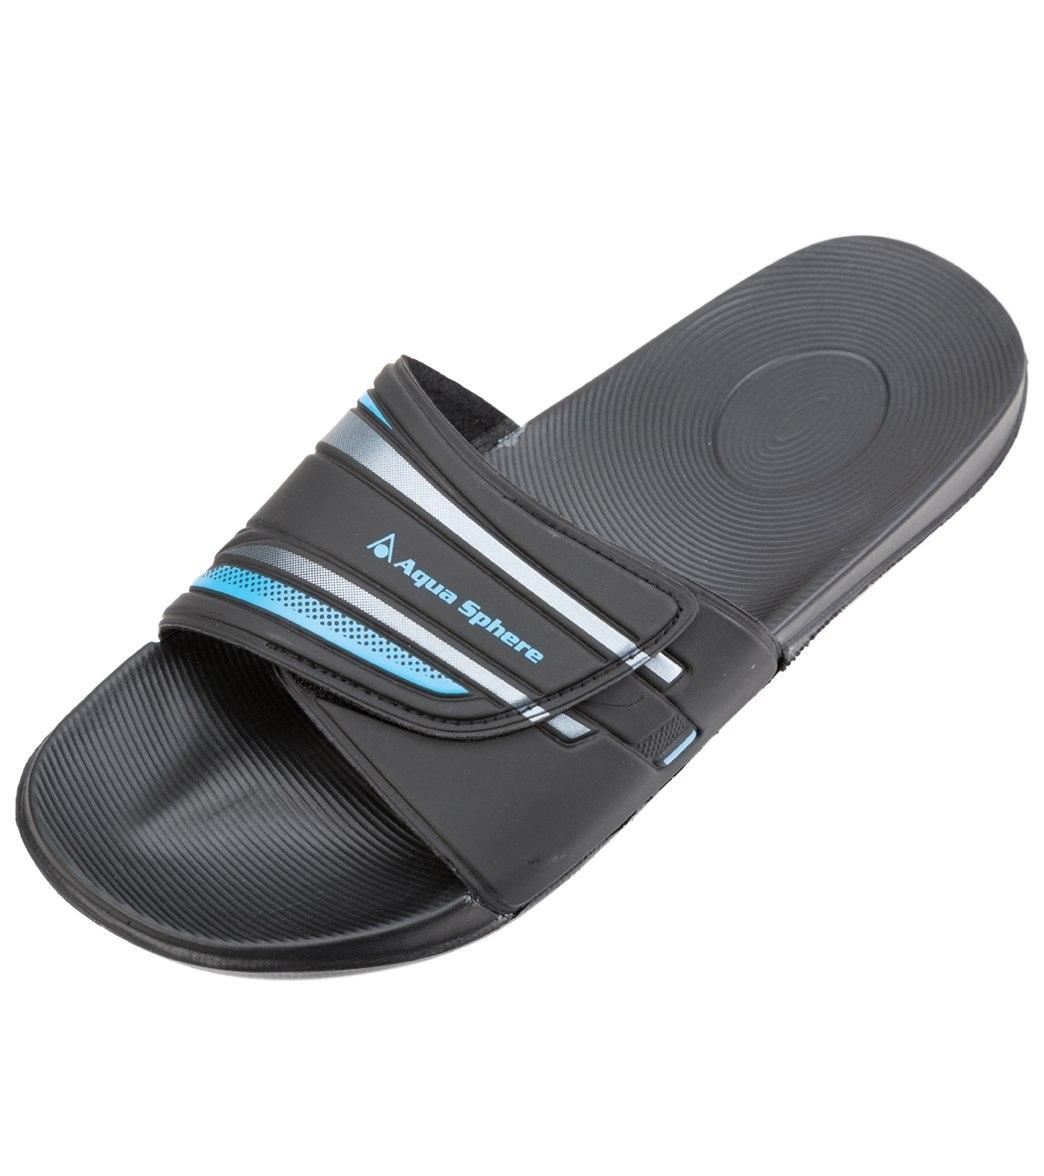 5d045da63556 Aqua Sphere Domino Slide Sandal at SwimOutlet.com